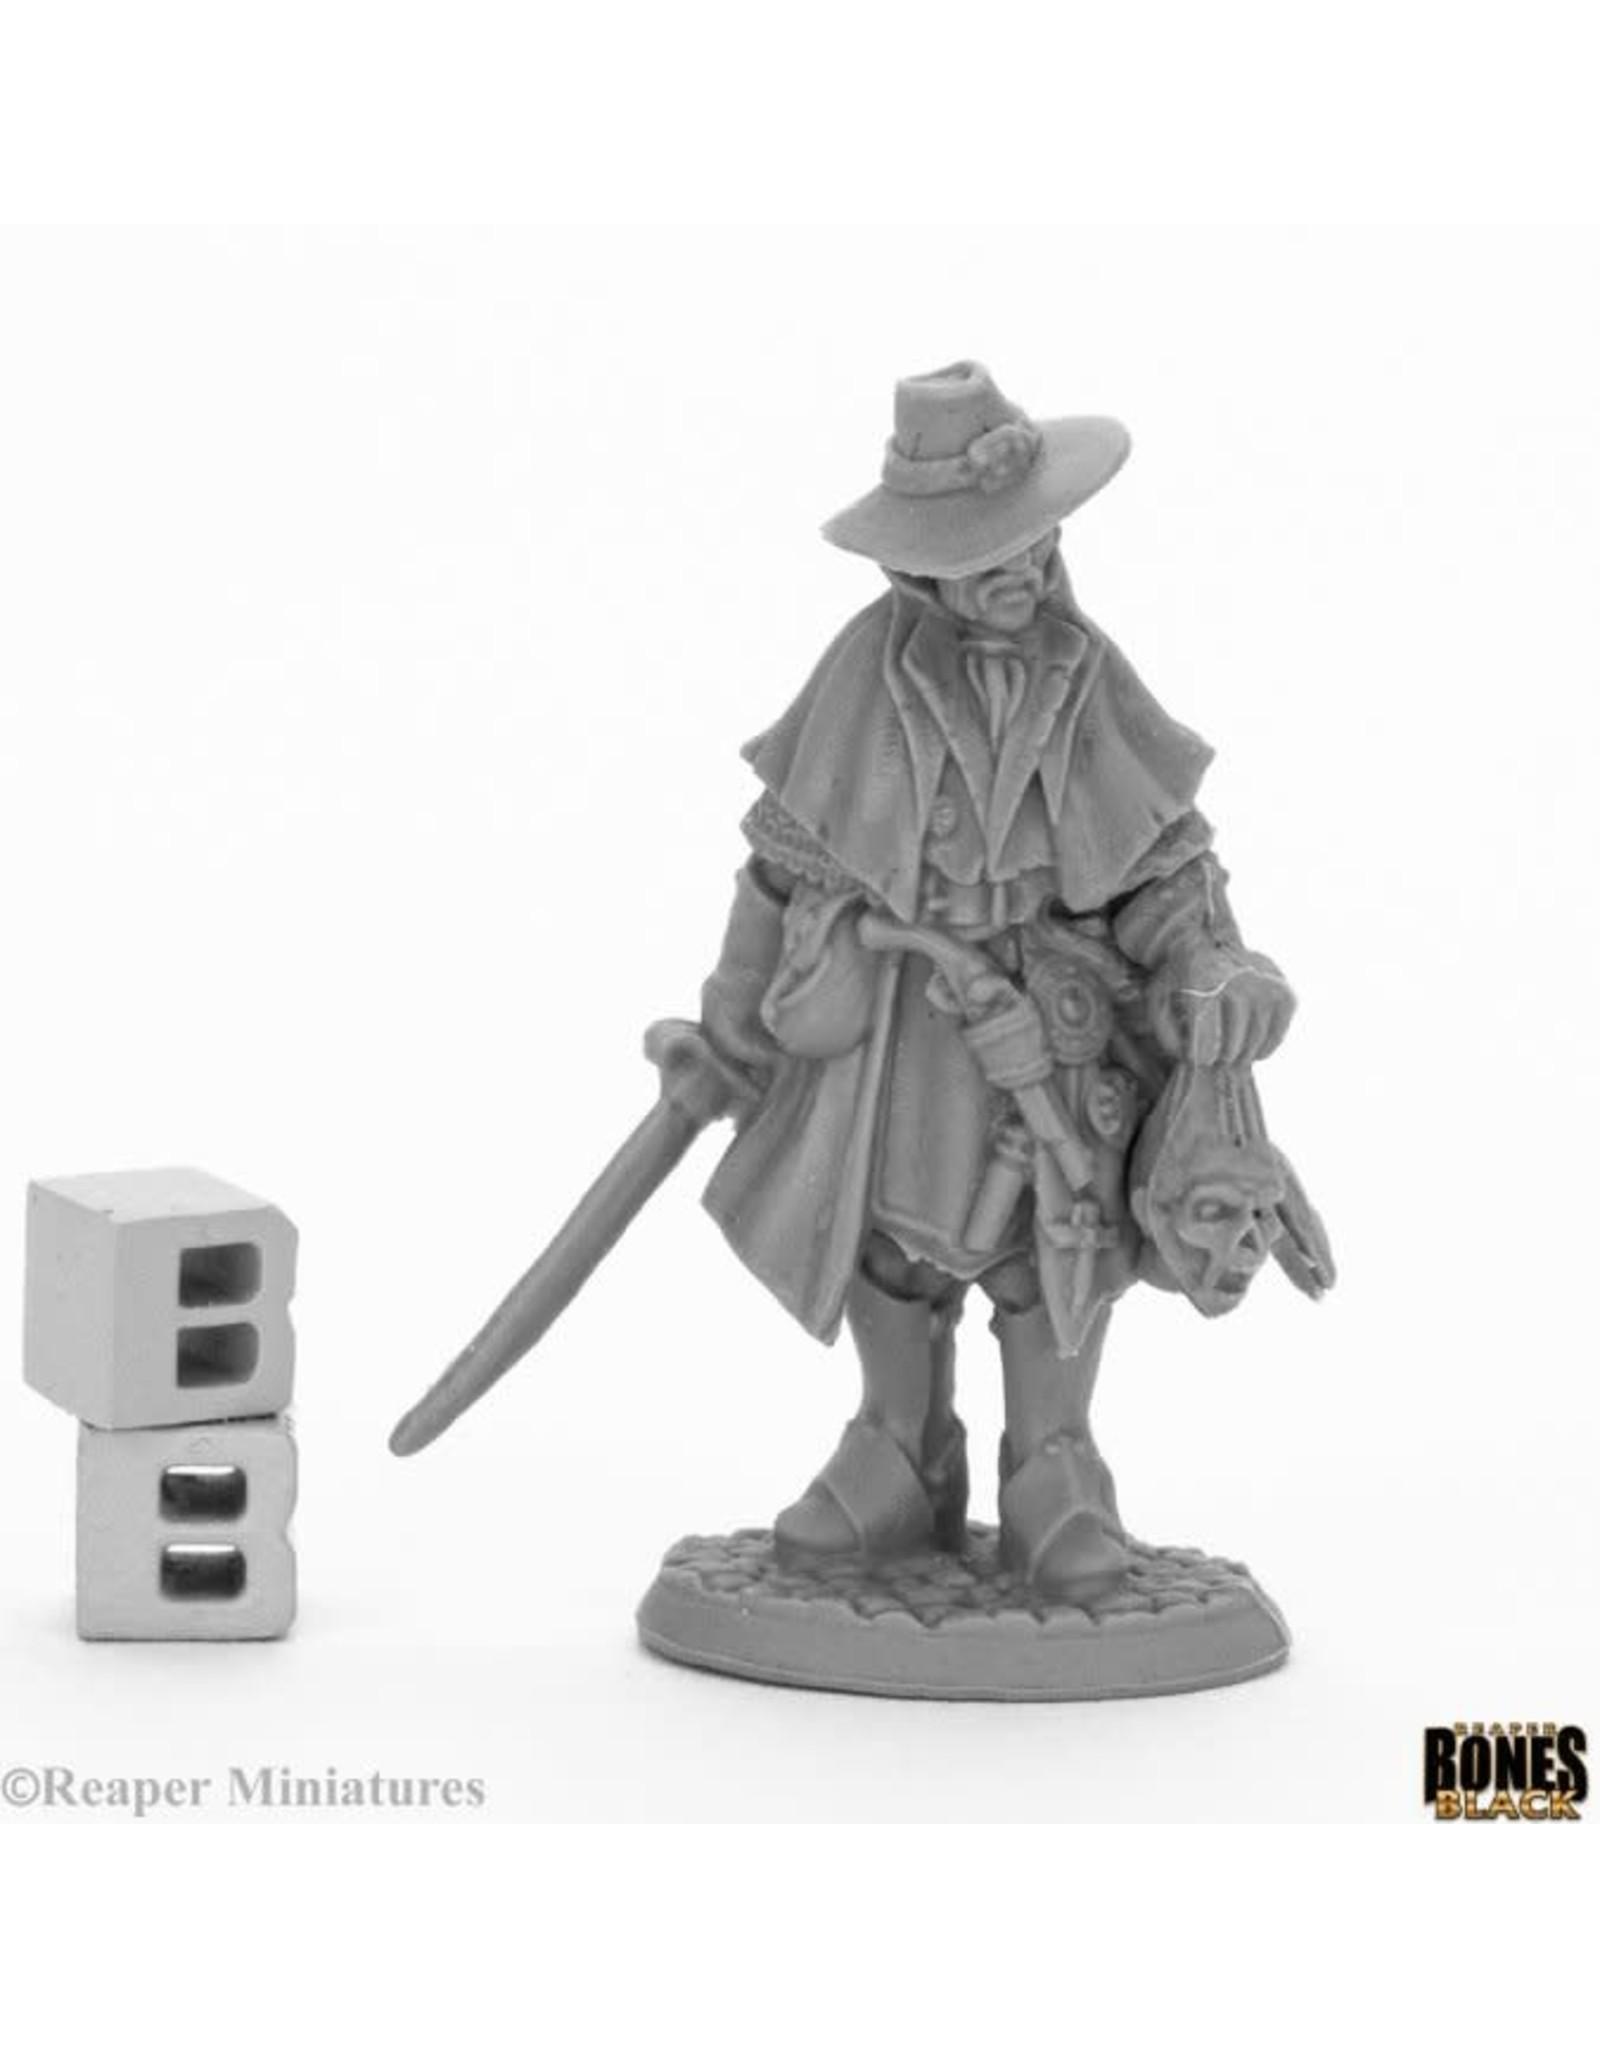 Reaper Miniatures Bones Black: Jakob Knochengard